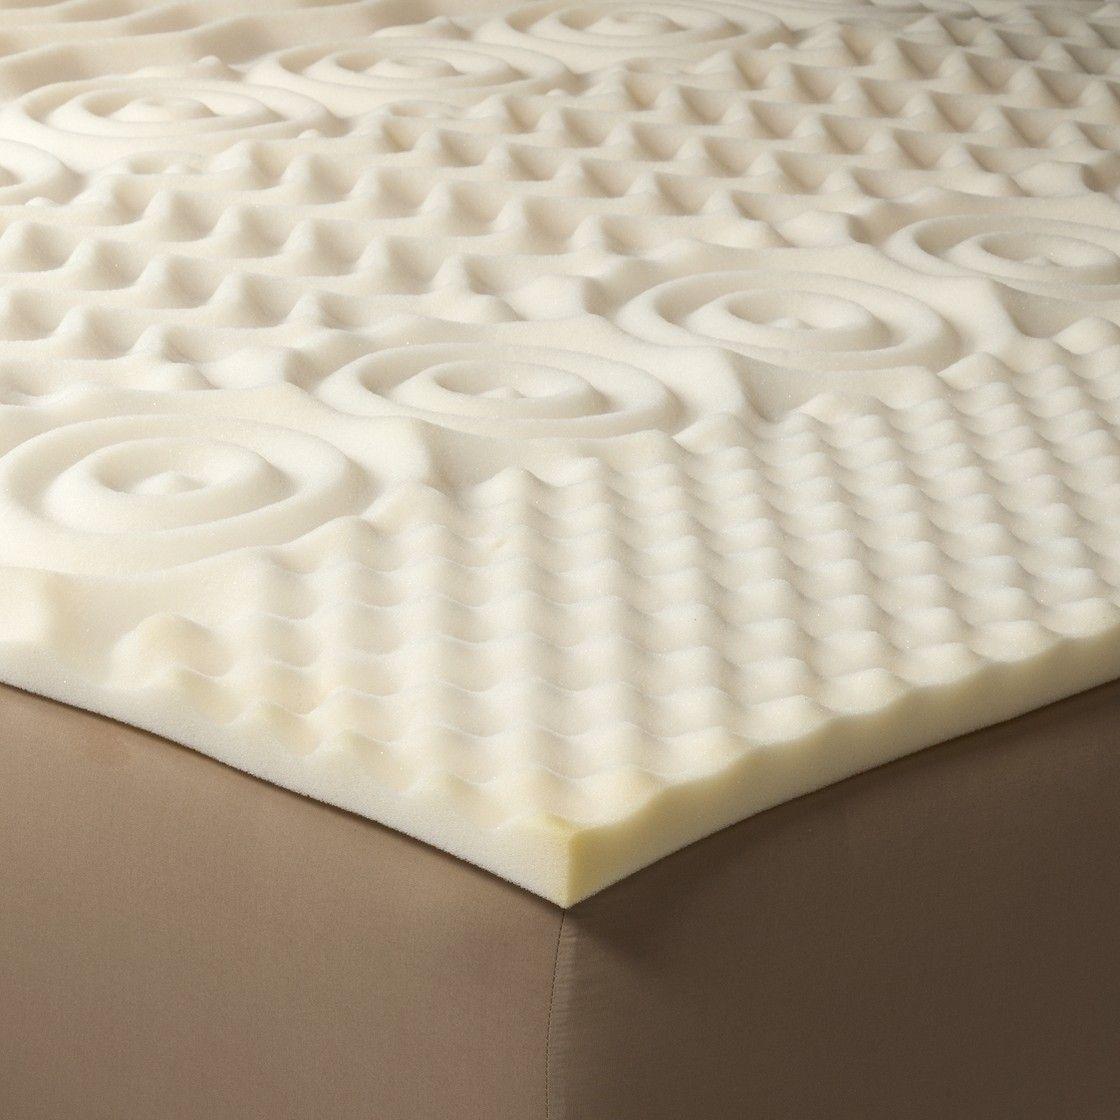 Room Essentials Comfy Foam Mattress Topper Foam mattress